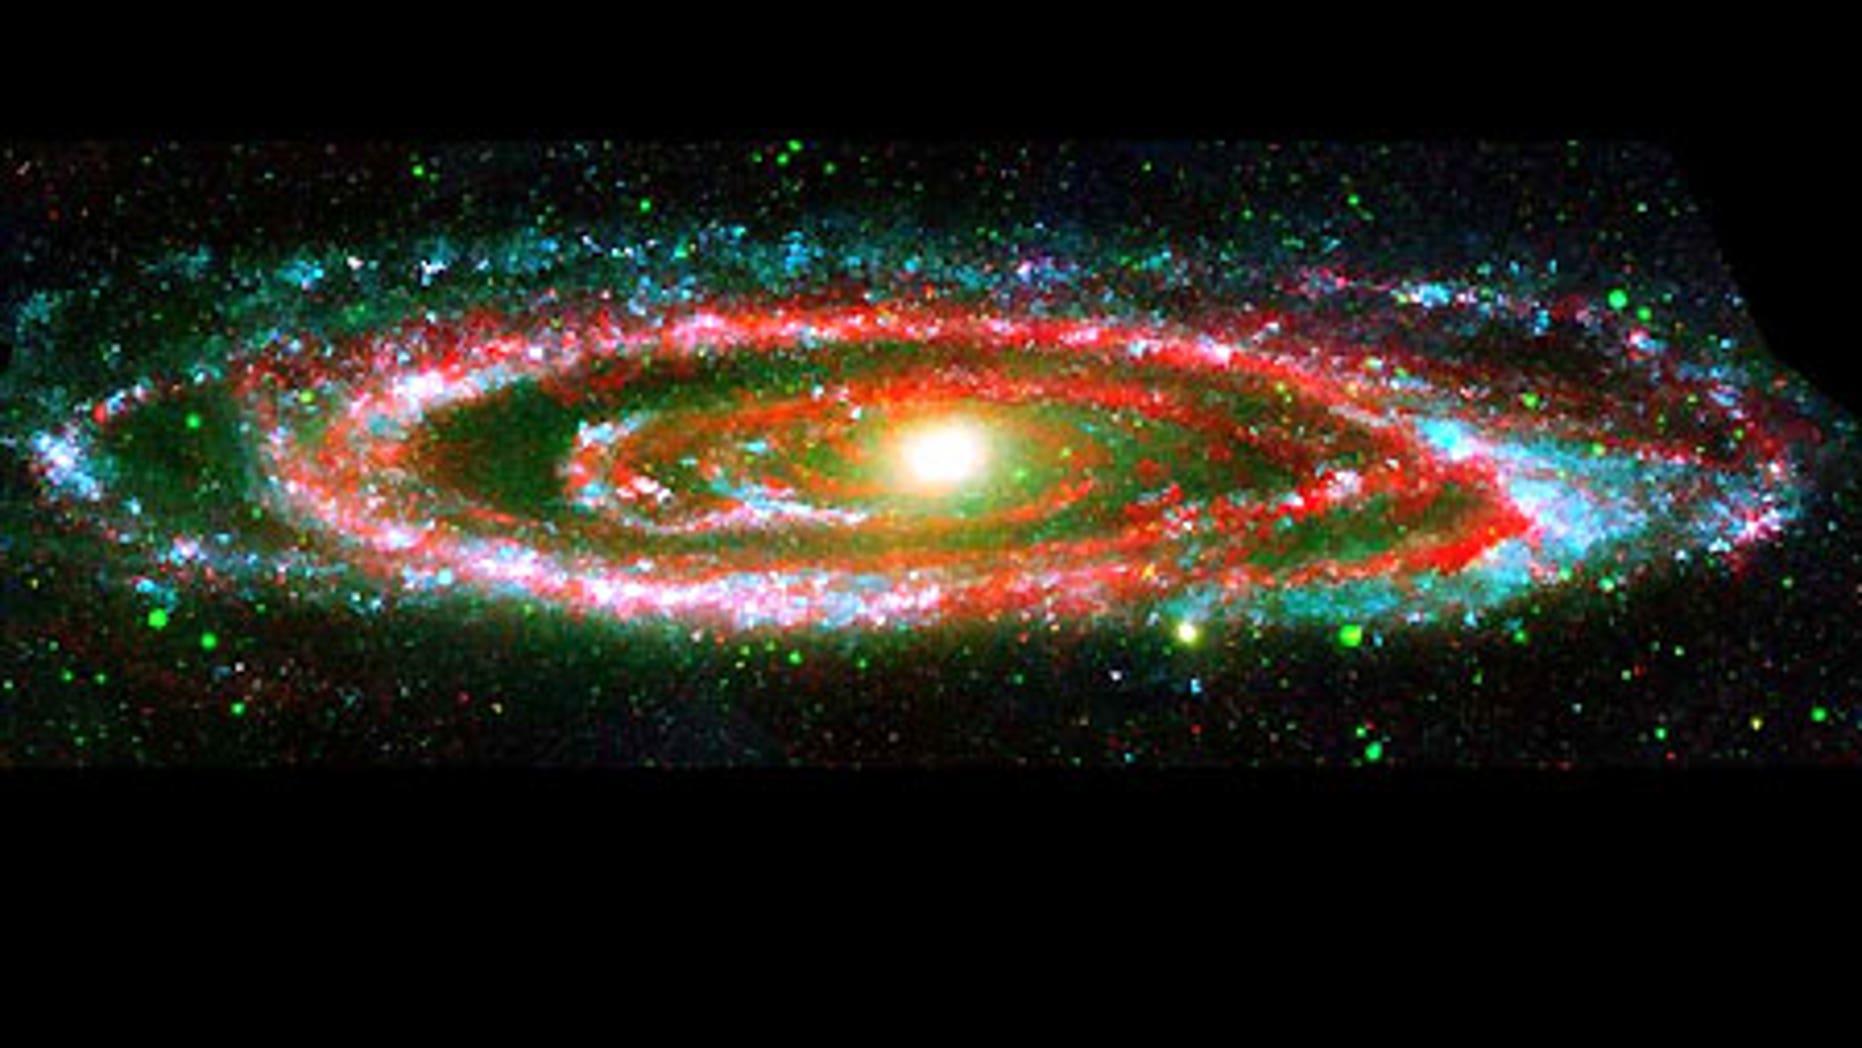 The Andromeda galaxy in a NASA composite image.